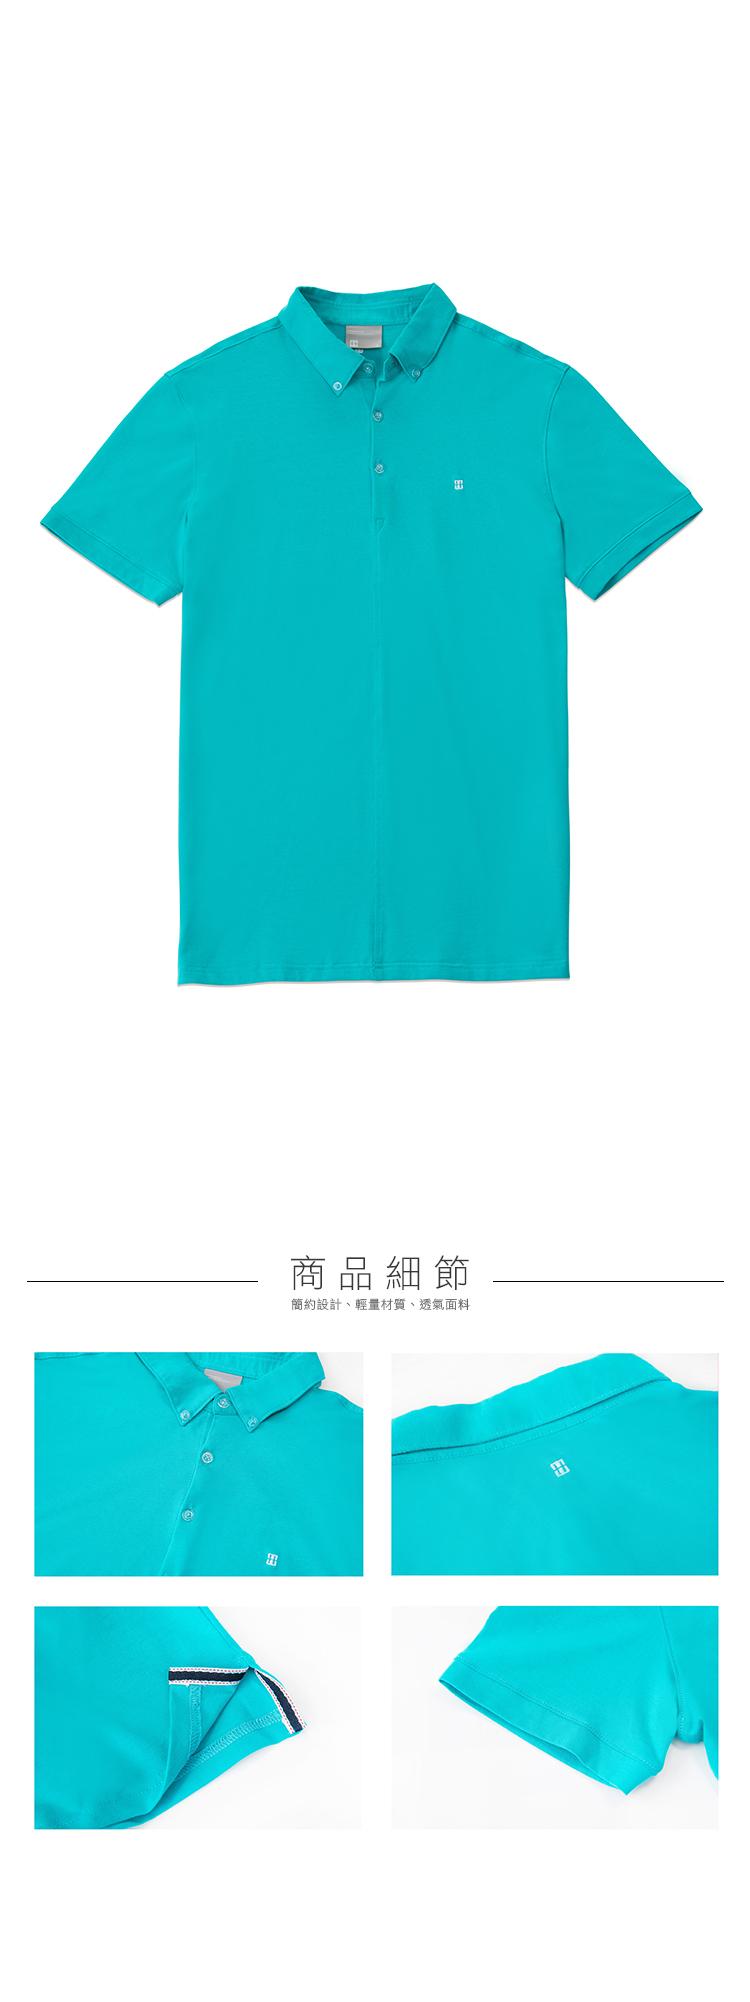 CL1SSM803- 湖水藍-750px